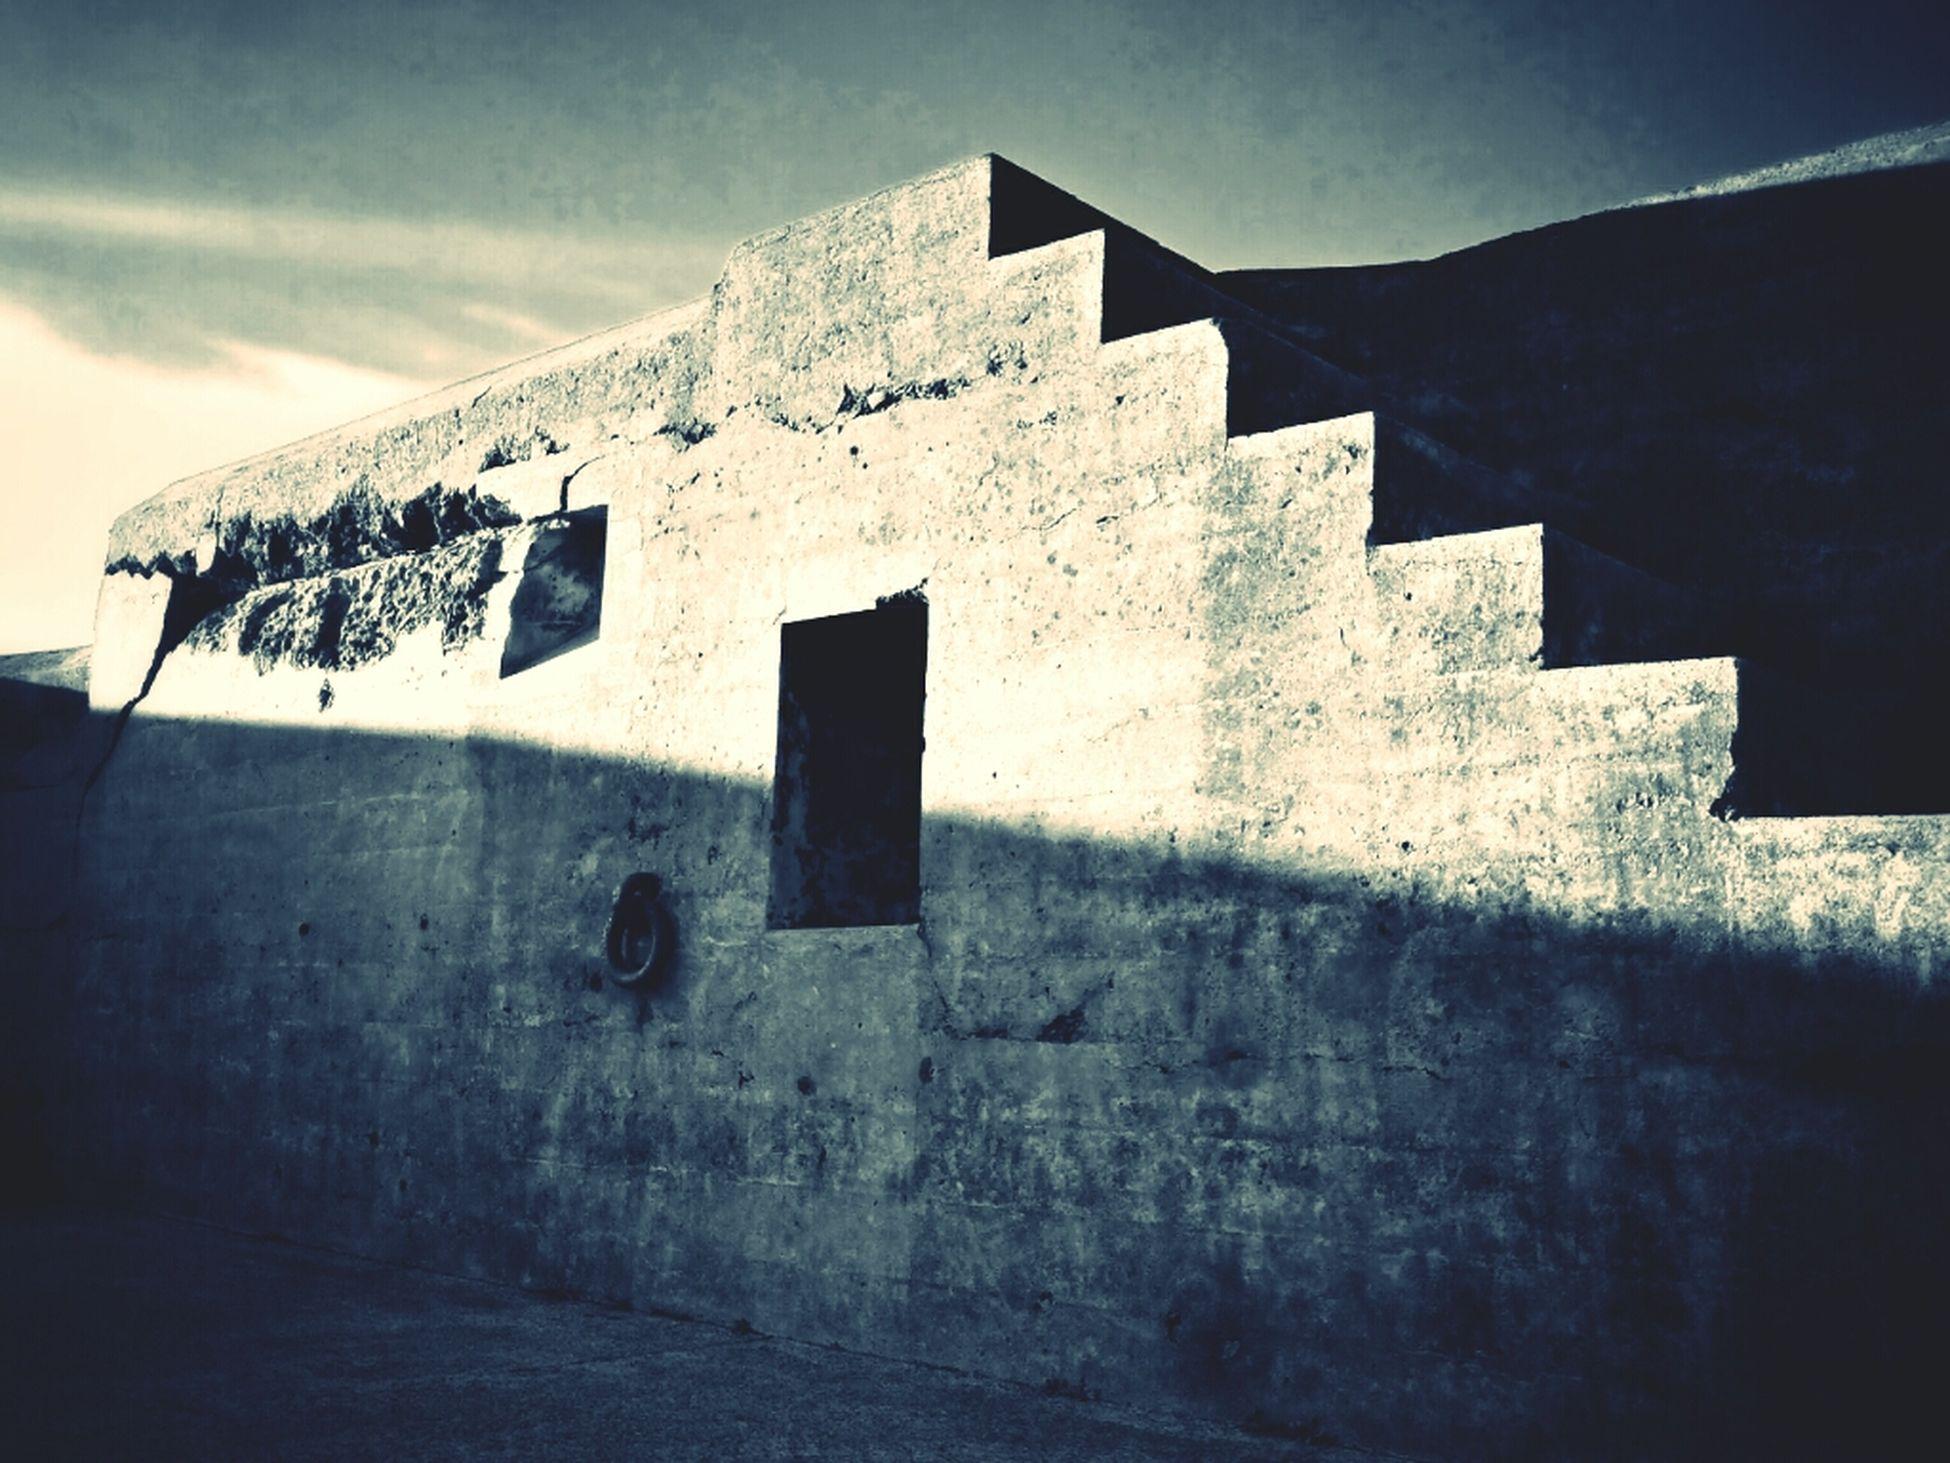 Jan 18: shadow Blackandwhite Black And White Stairs Shadow Concrete Monochrome Eye4photography  Fmsphotoaday